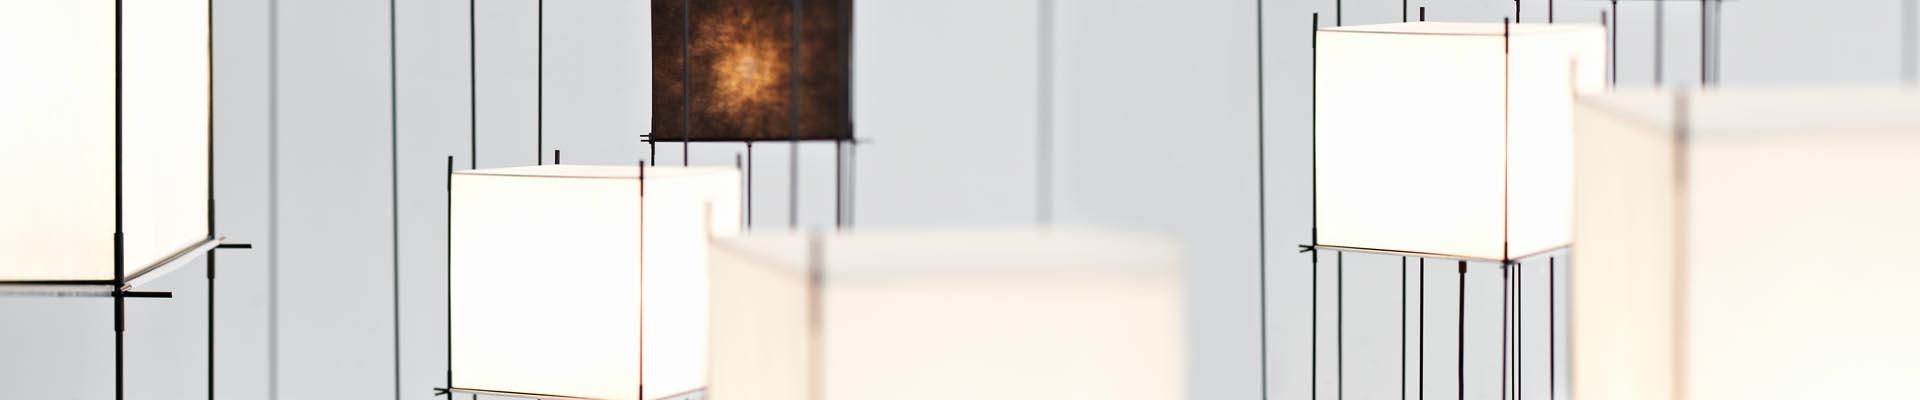 Hollands Licht vloerlampen